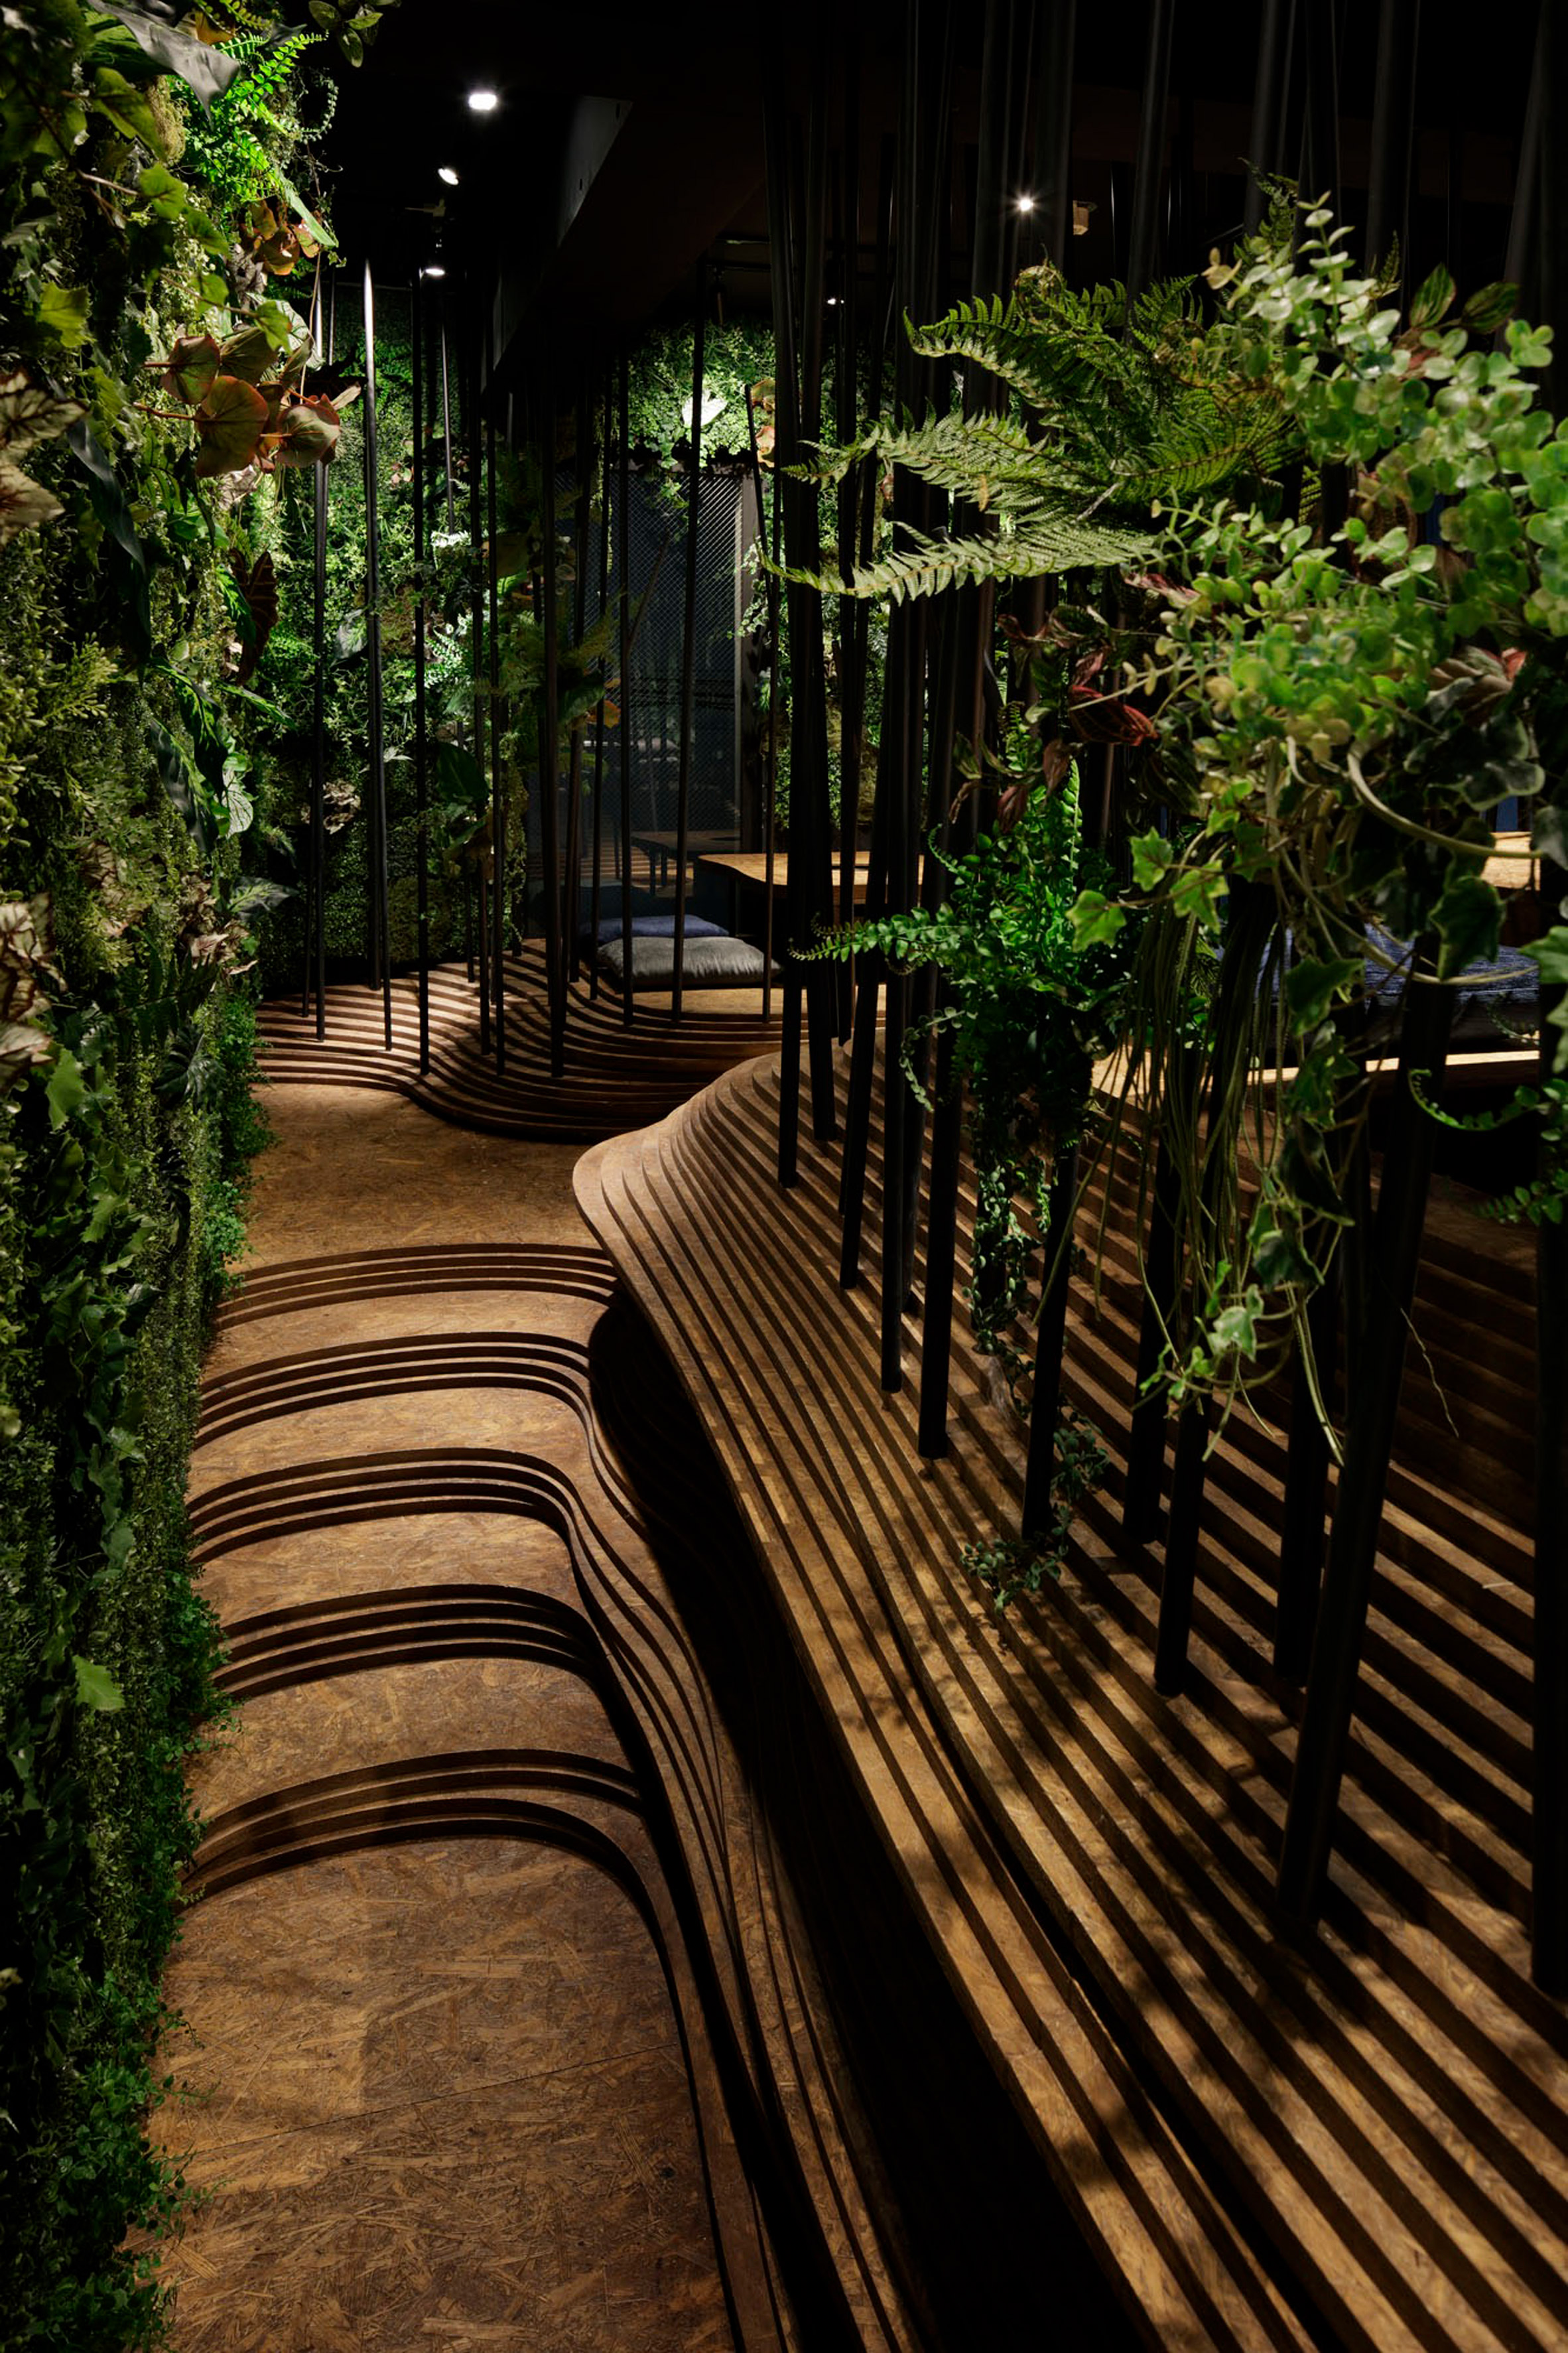 nikunotoriko-restaurant-interiors-tokyo-ryoji-Iedokoro-japan_dezeen_2364_col_7